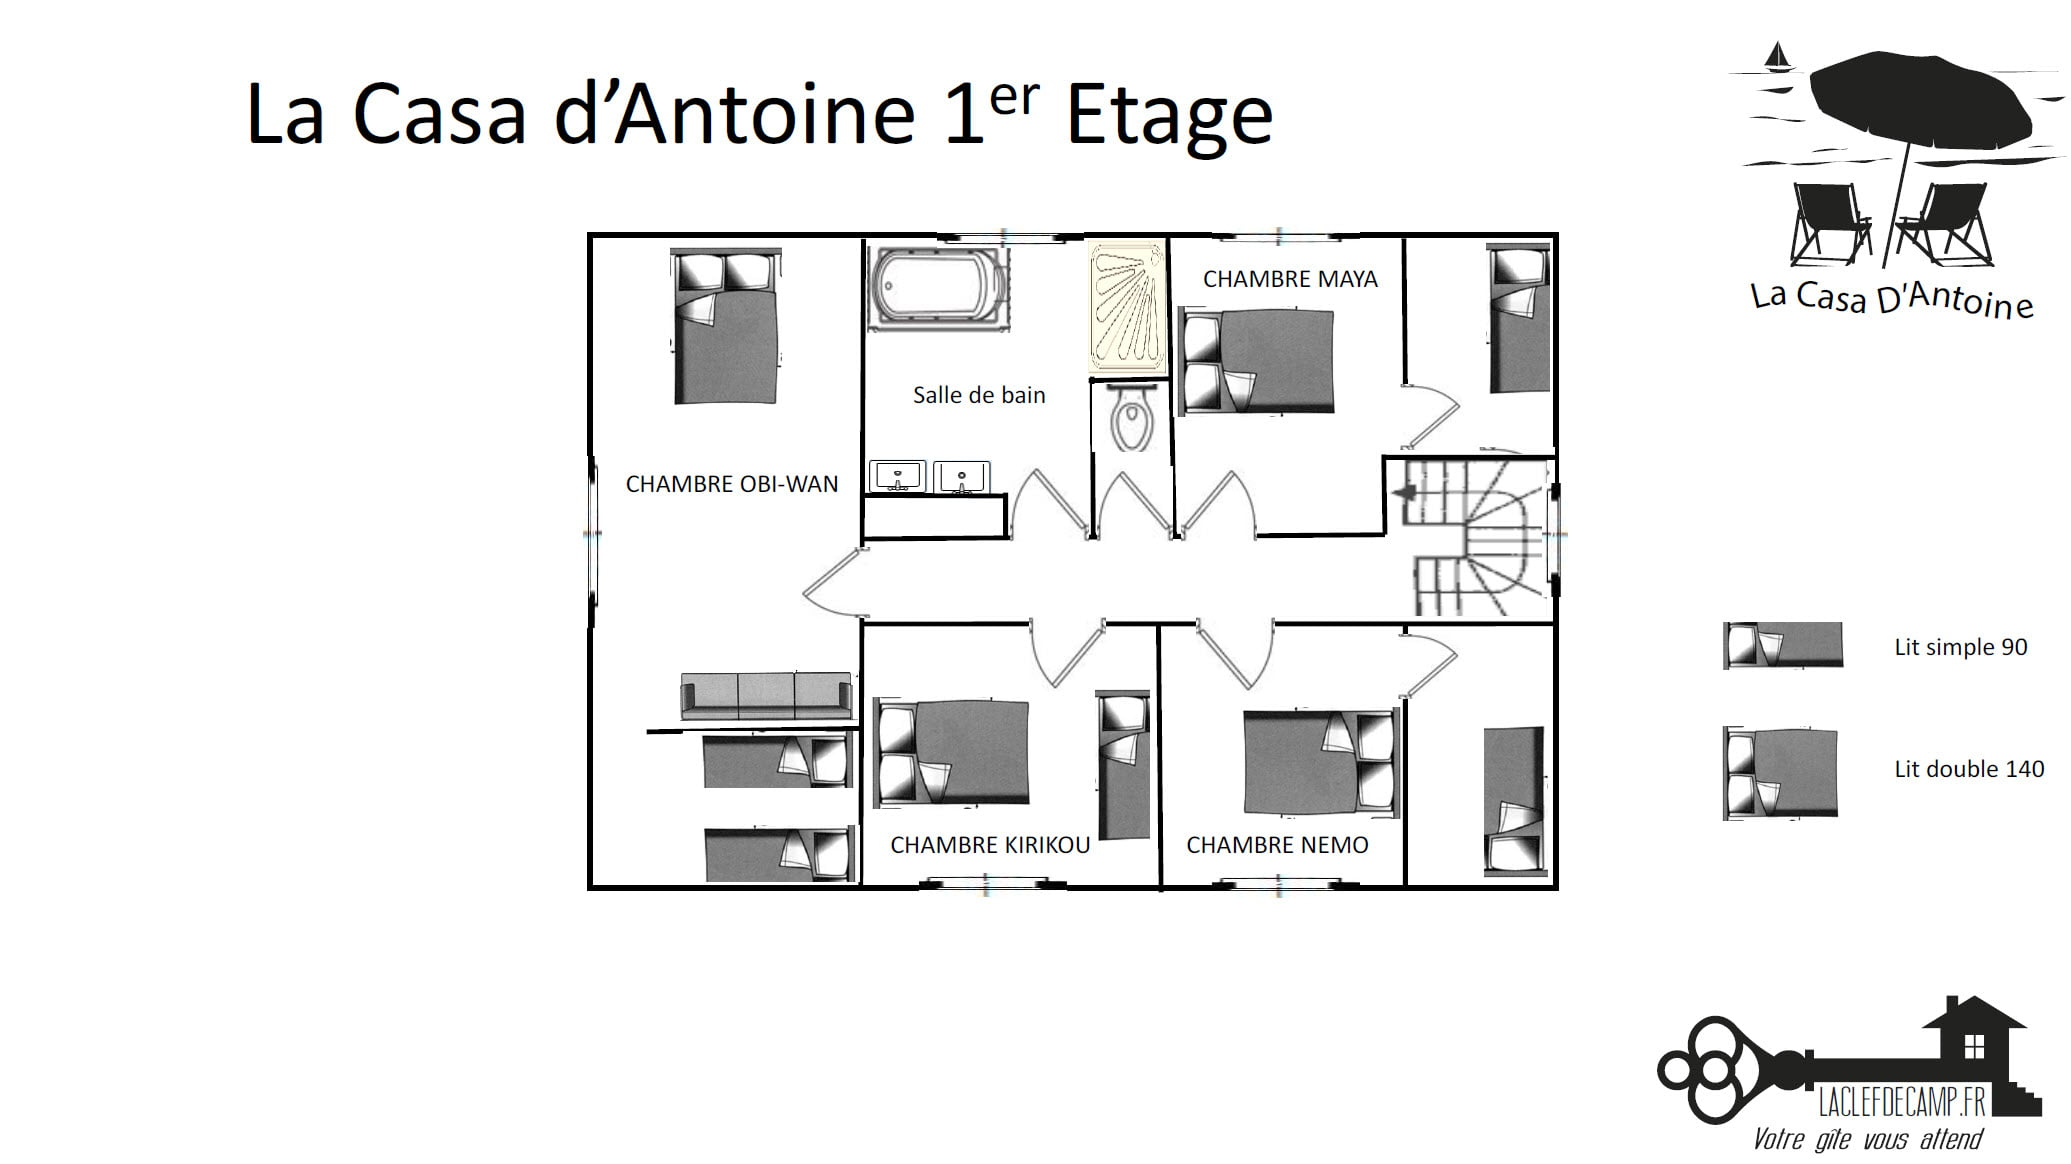 La casa dantoine 1er - La Casa d'Antoine - Location de Gite La Clef Decamp - Laclefdecamp.fr